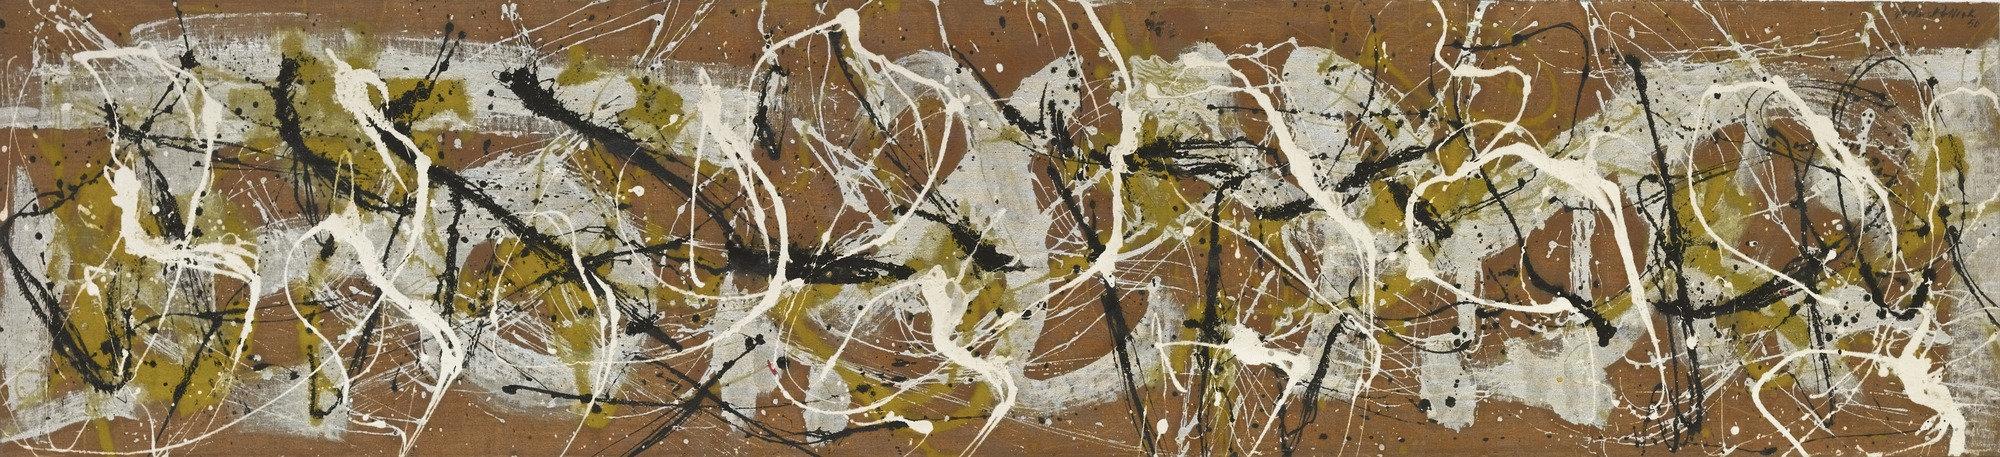 Jackson Pollock,  Number 7,  1950, Museum of Modern Art, New York.